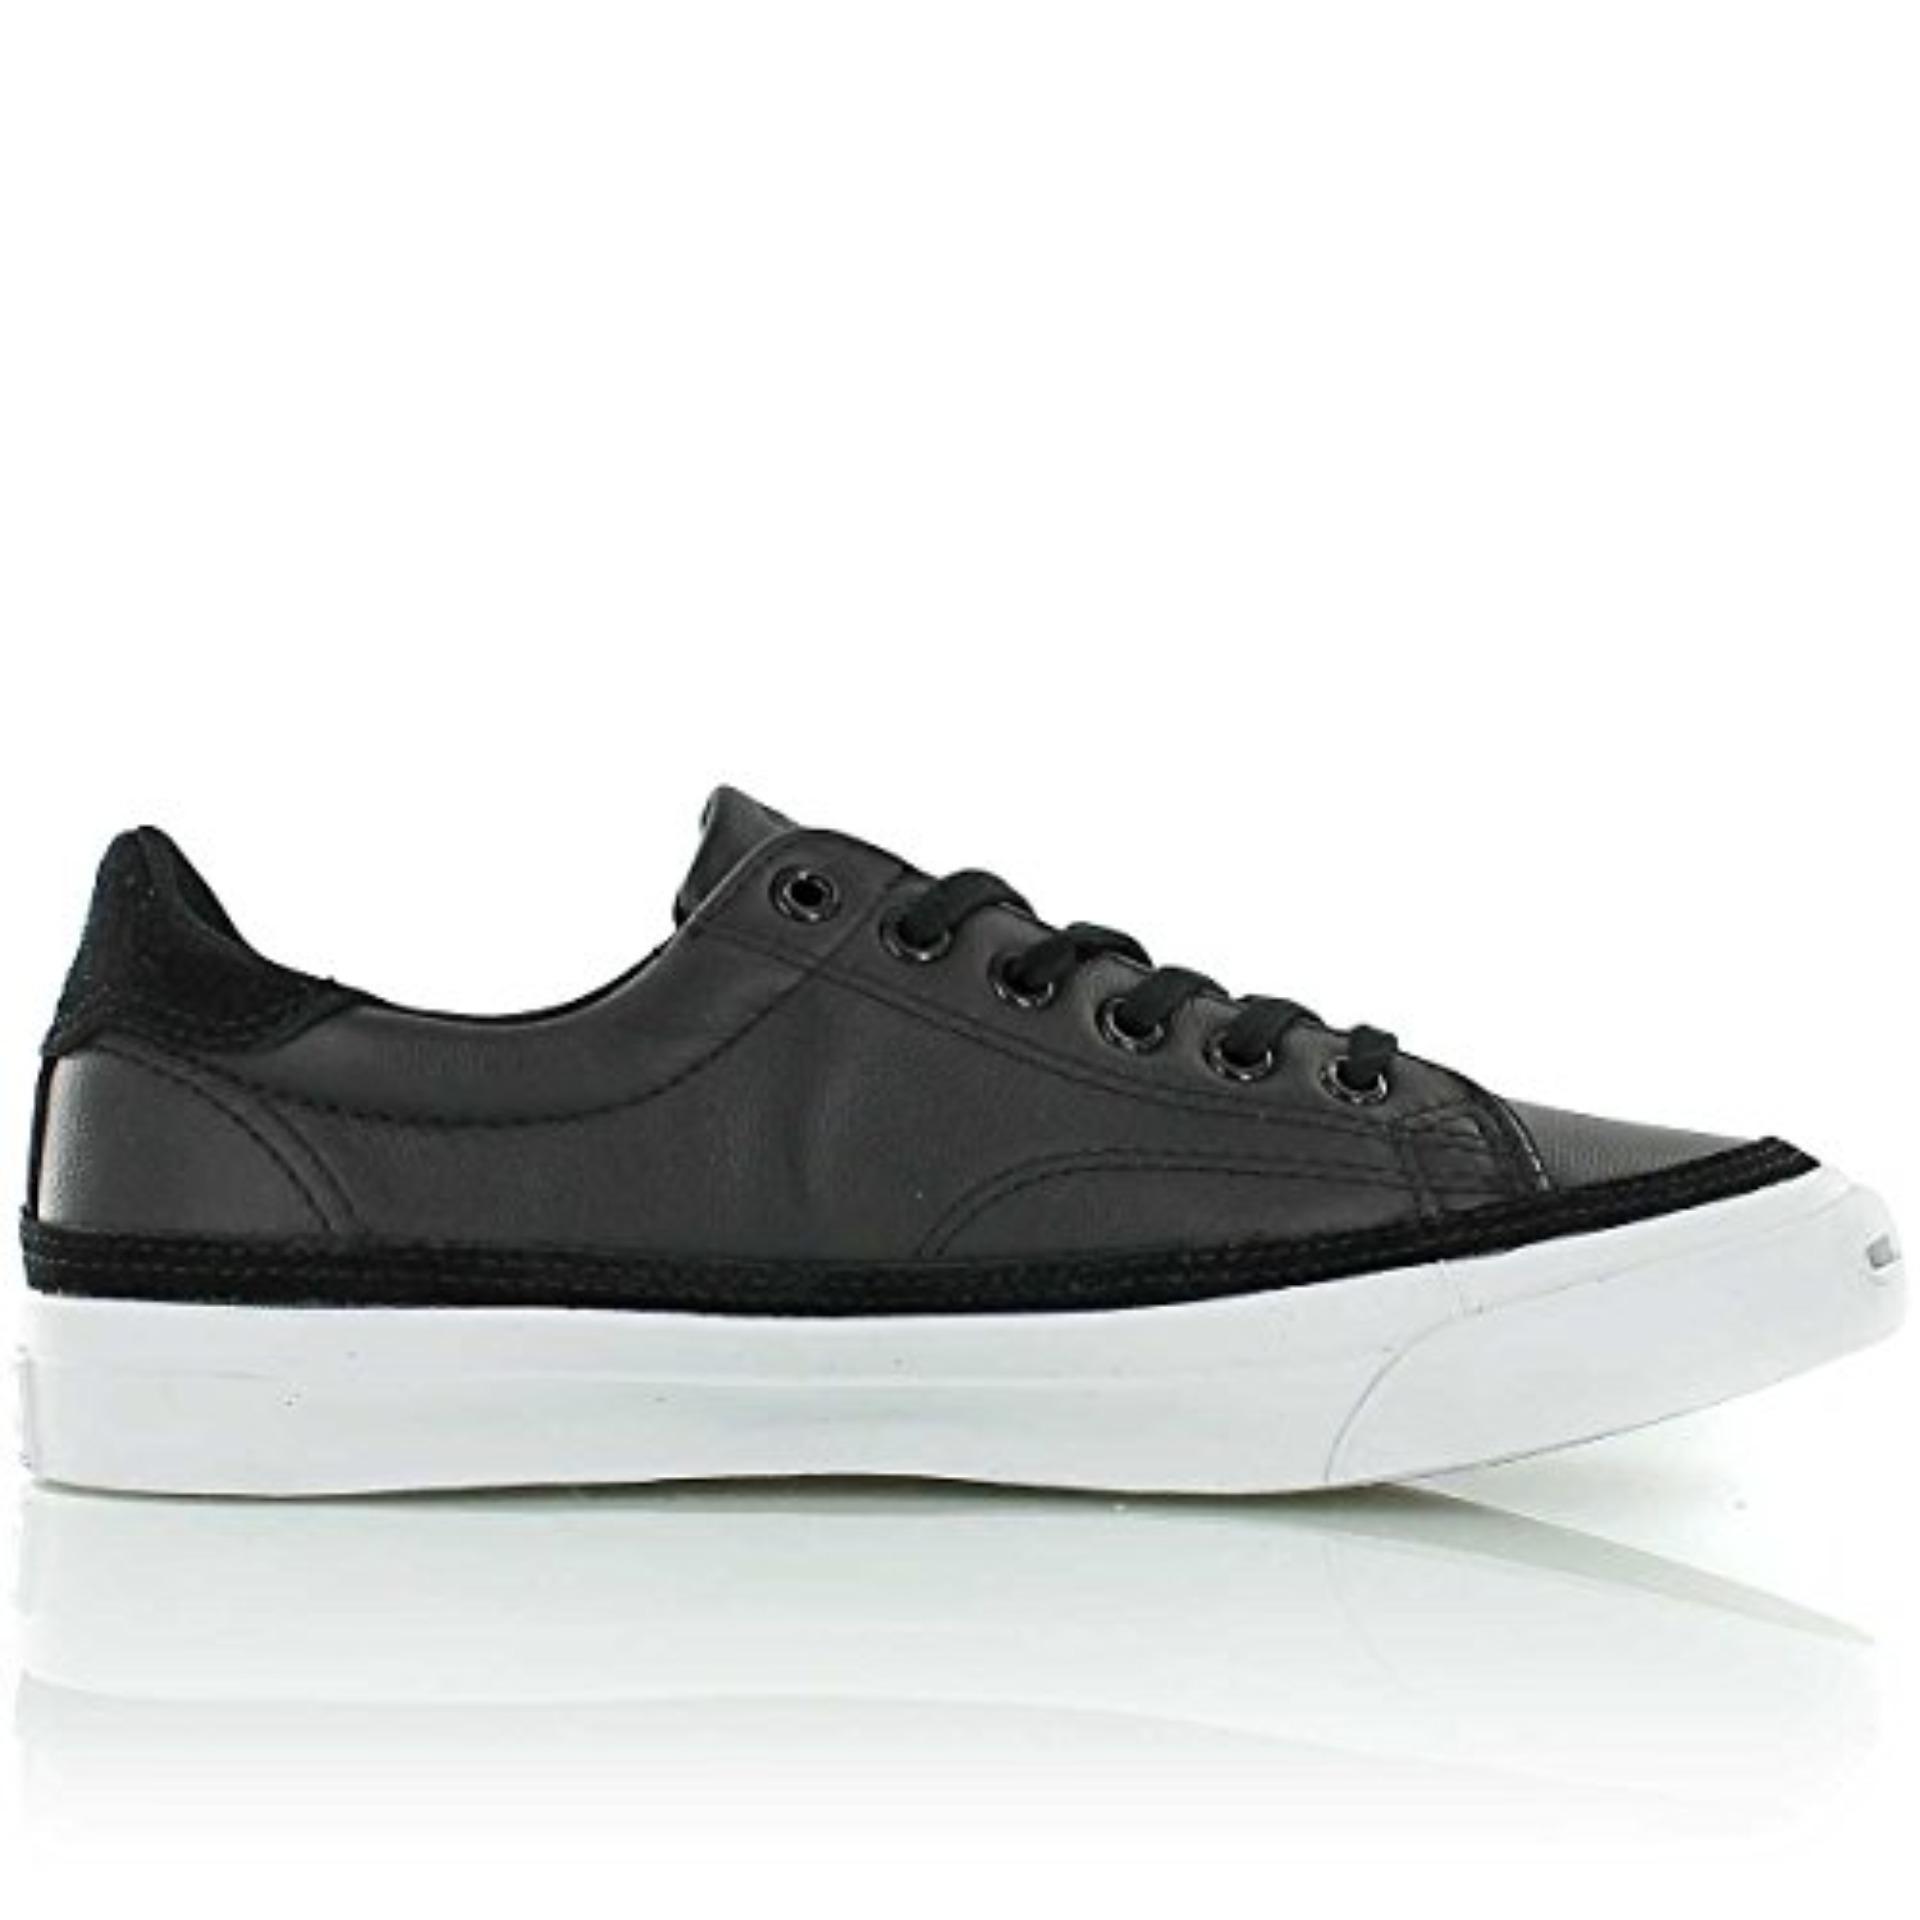 Converse Jack Purcell II OX Leather Sepatu Sneakers Pria